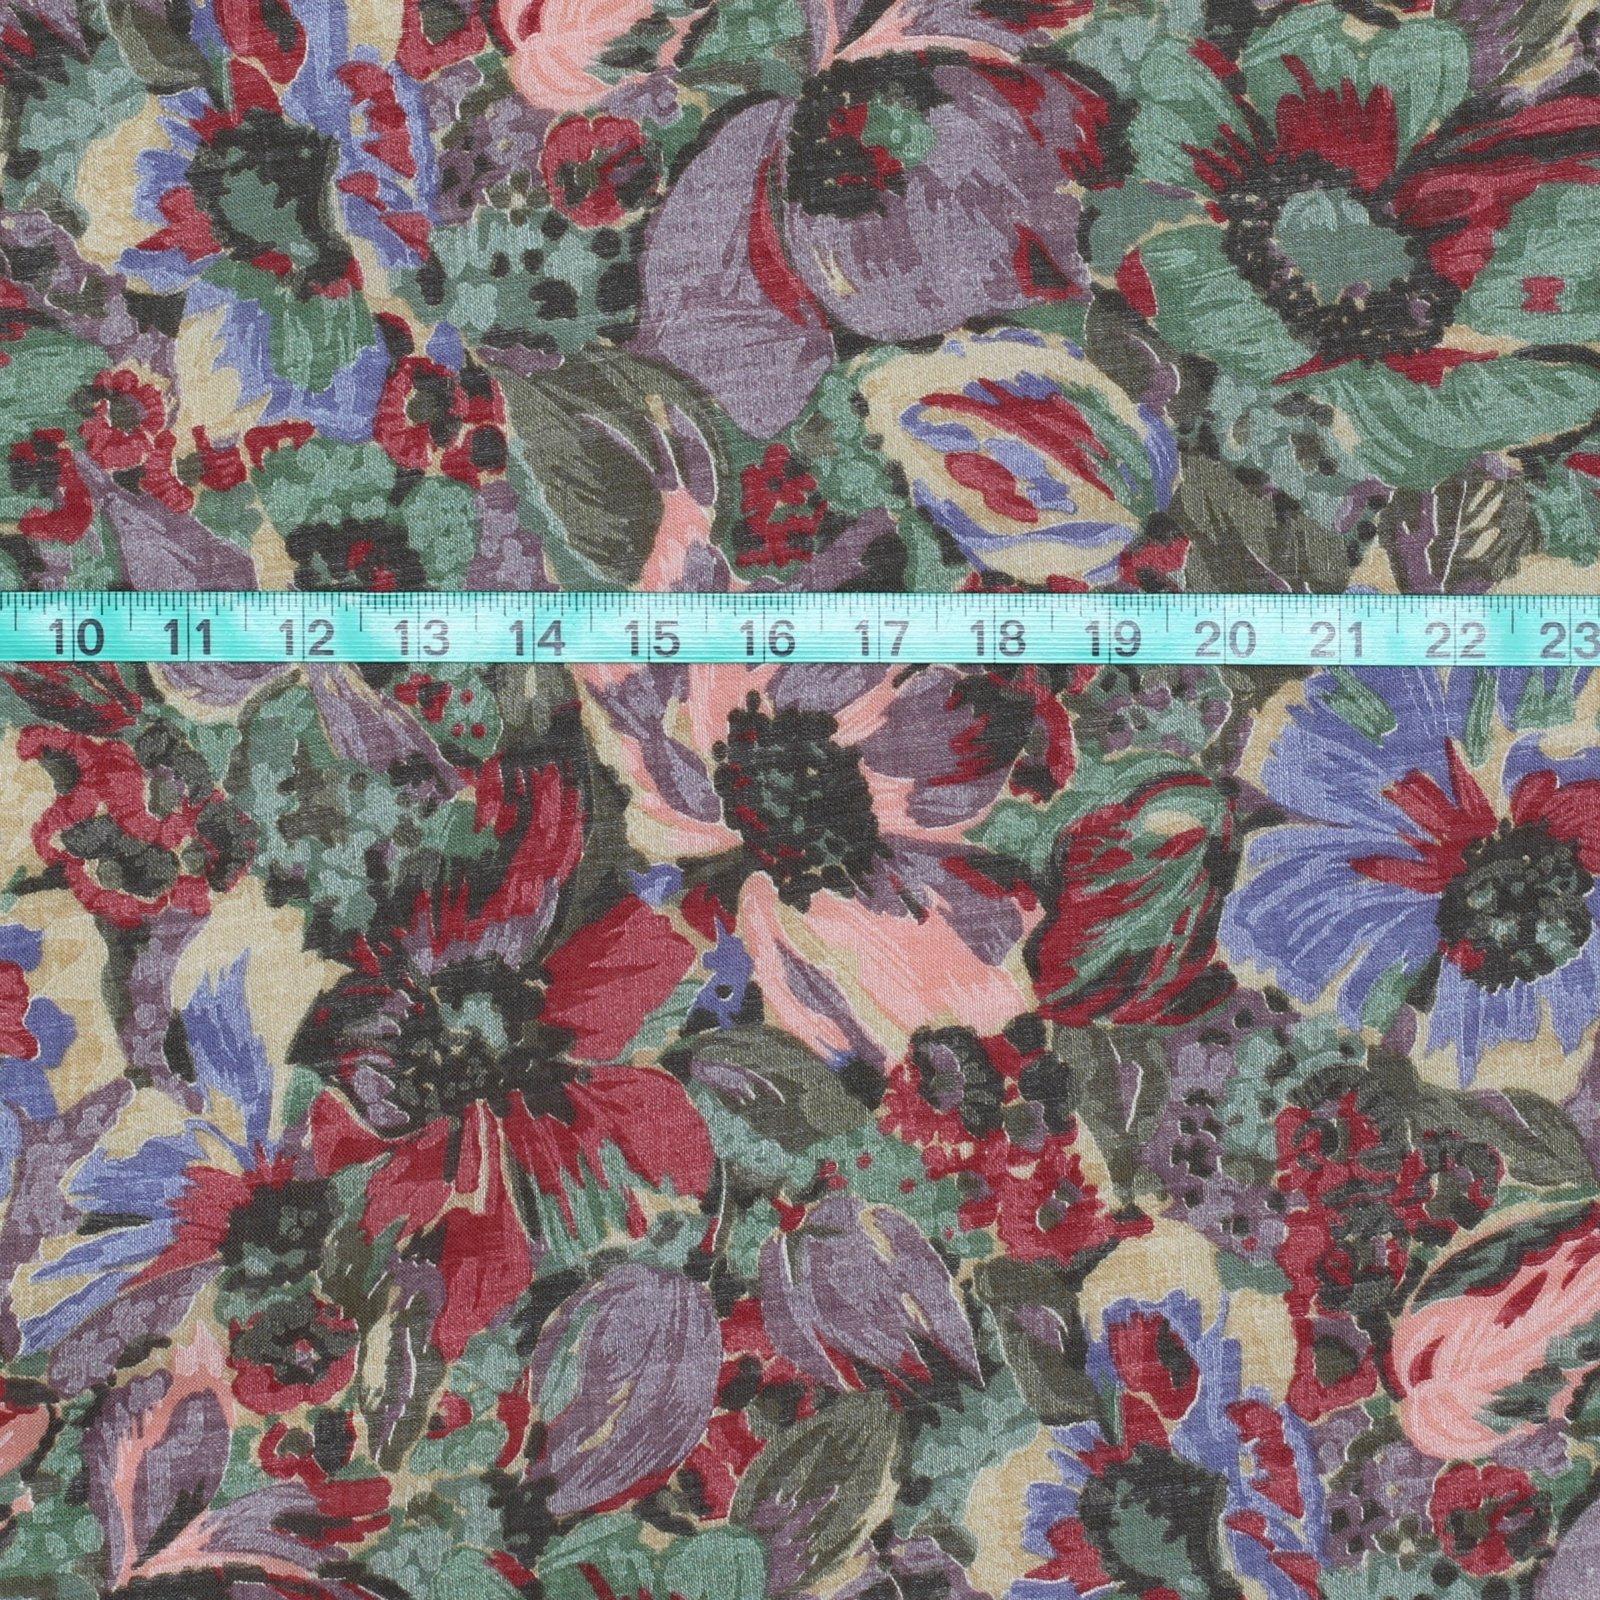 Wool/Cotton Voile Floral Print